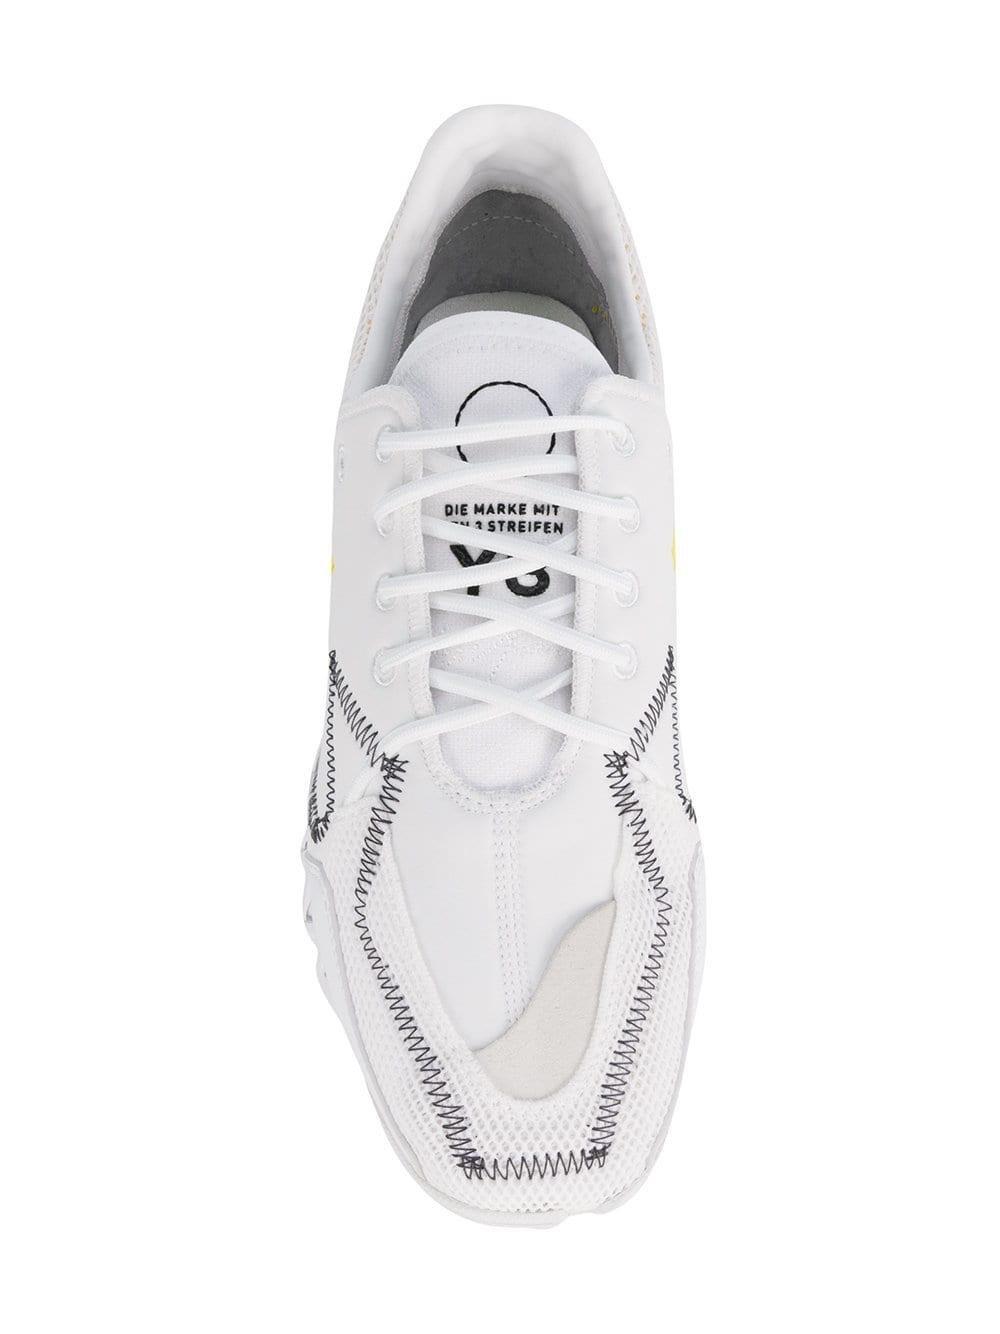 Y-3 Leather Y3 Adidas X Yohji Yamamoto Ekika Trainers in White